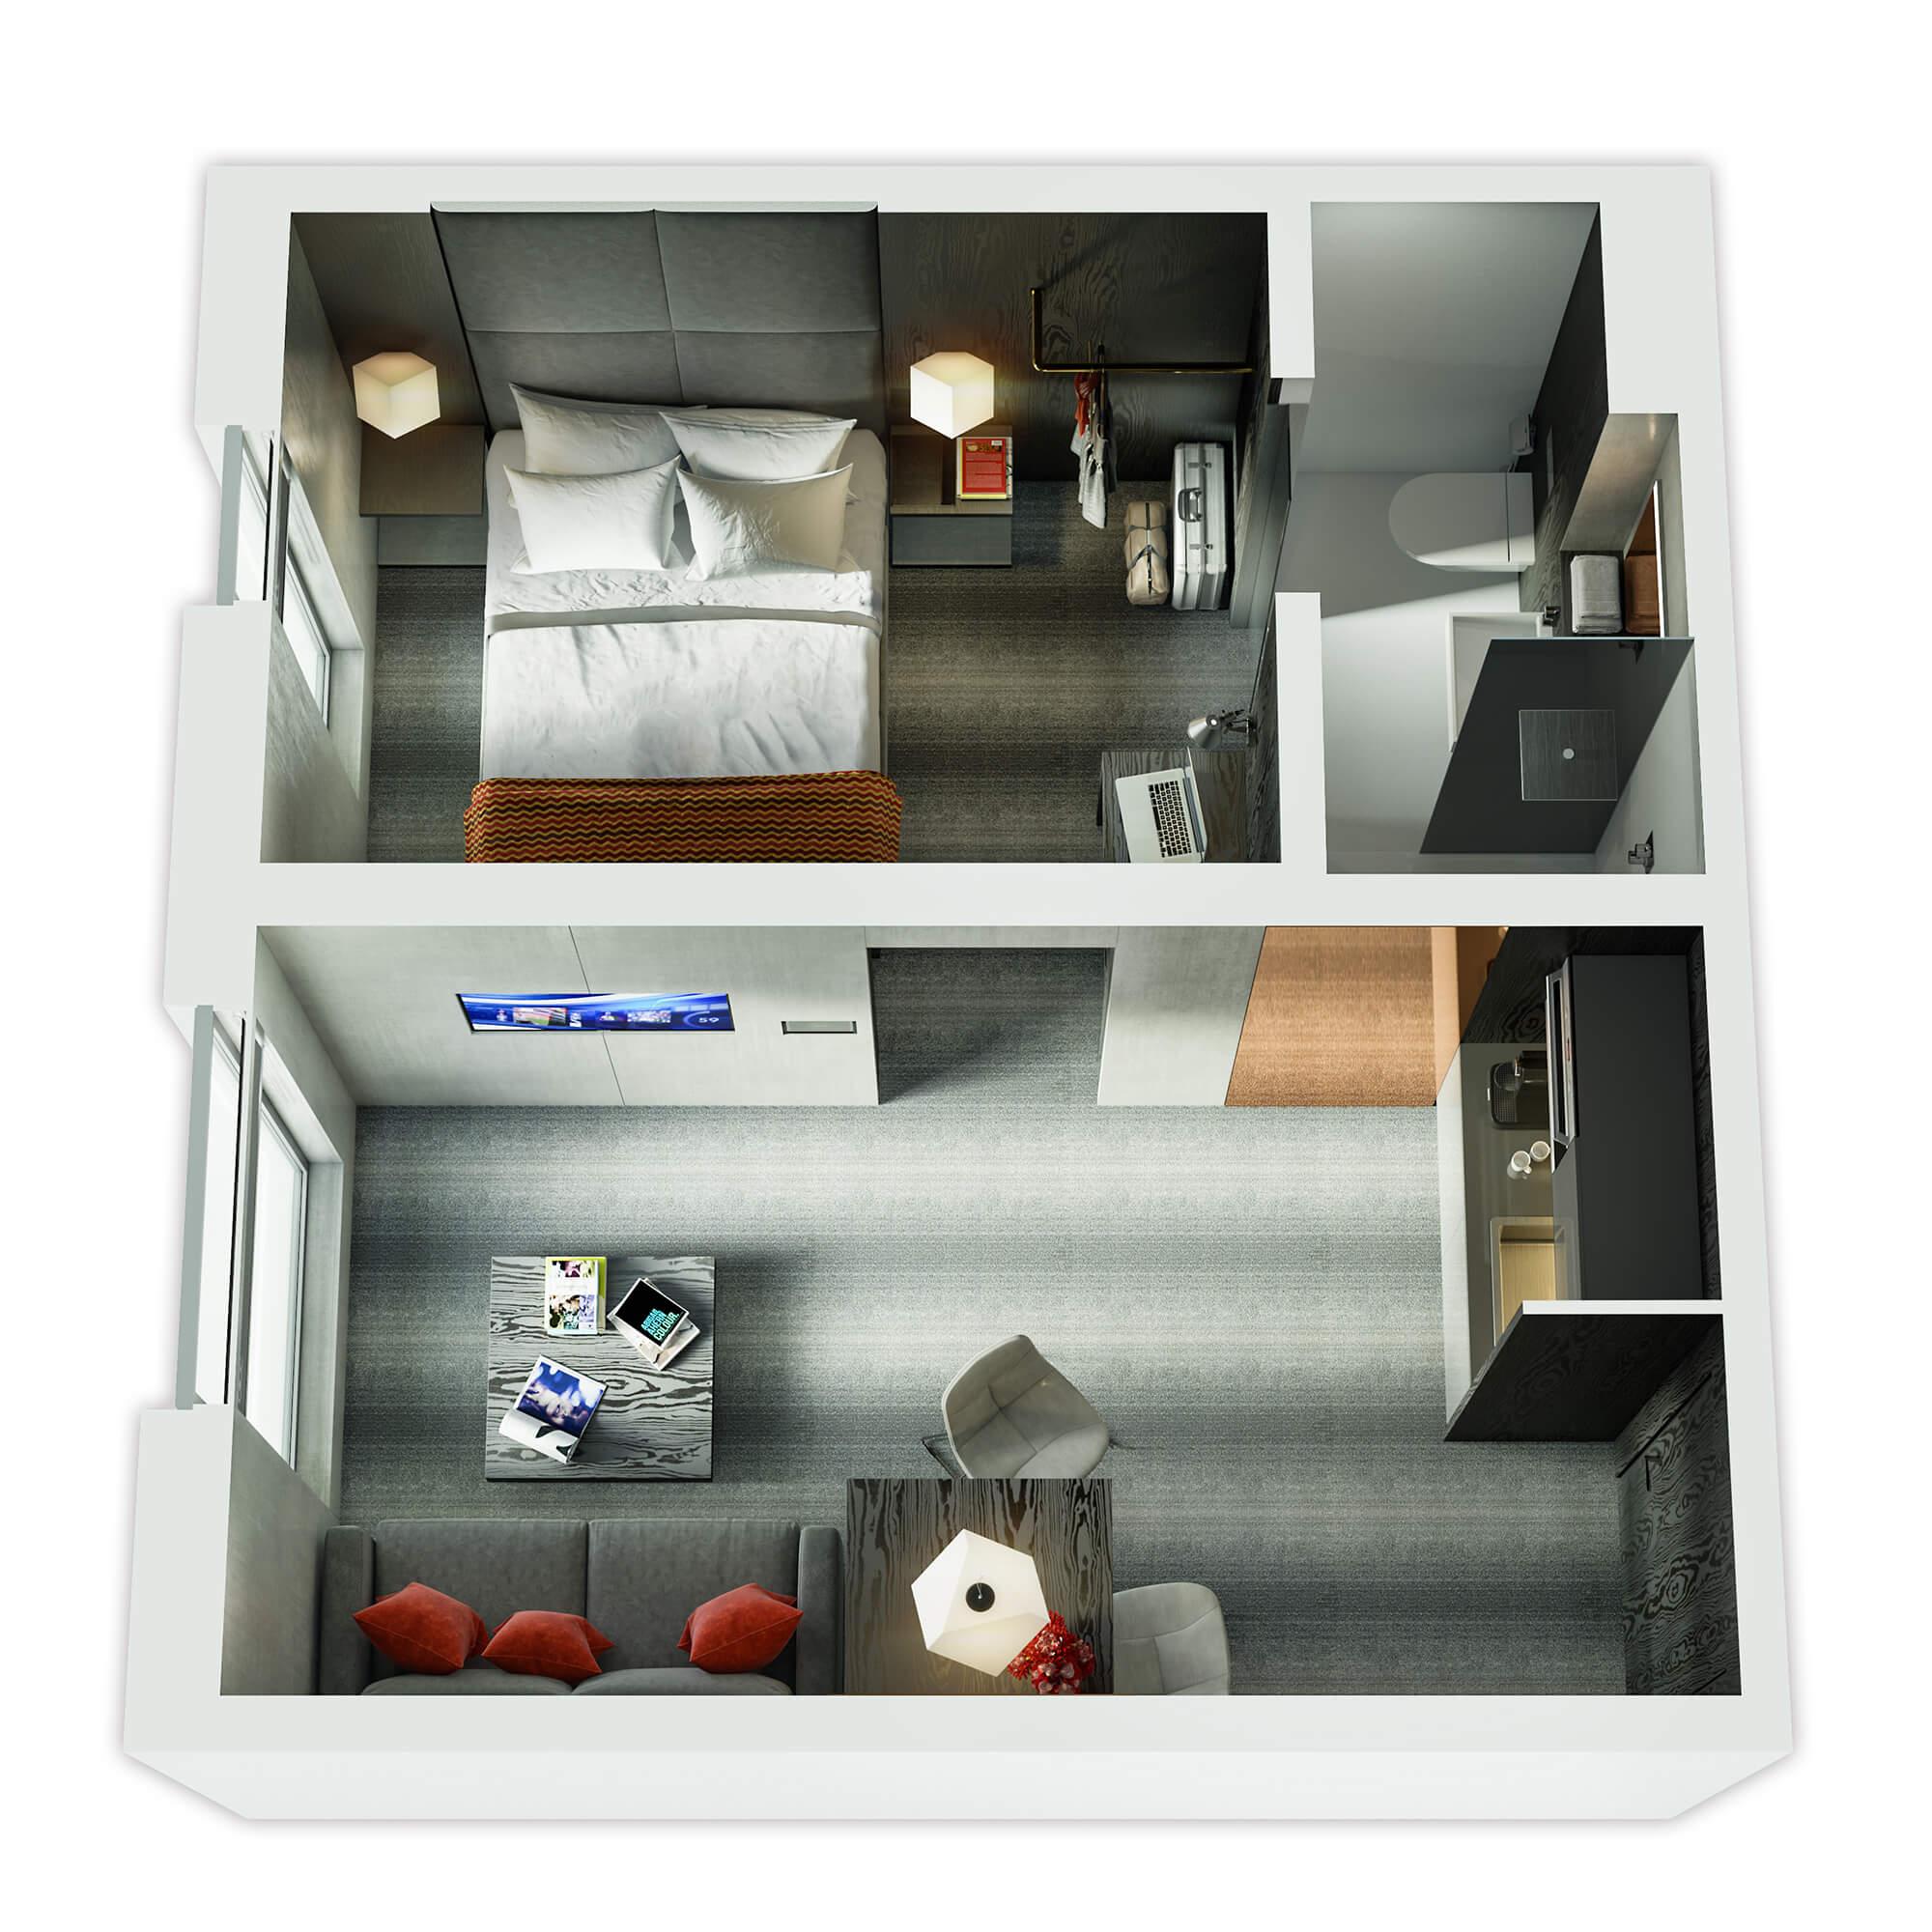 WHITE CROW STUDIOS - BLOC HOTEL - 3D FLOORPLAN